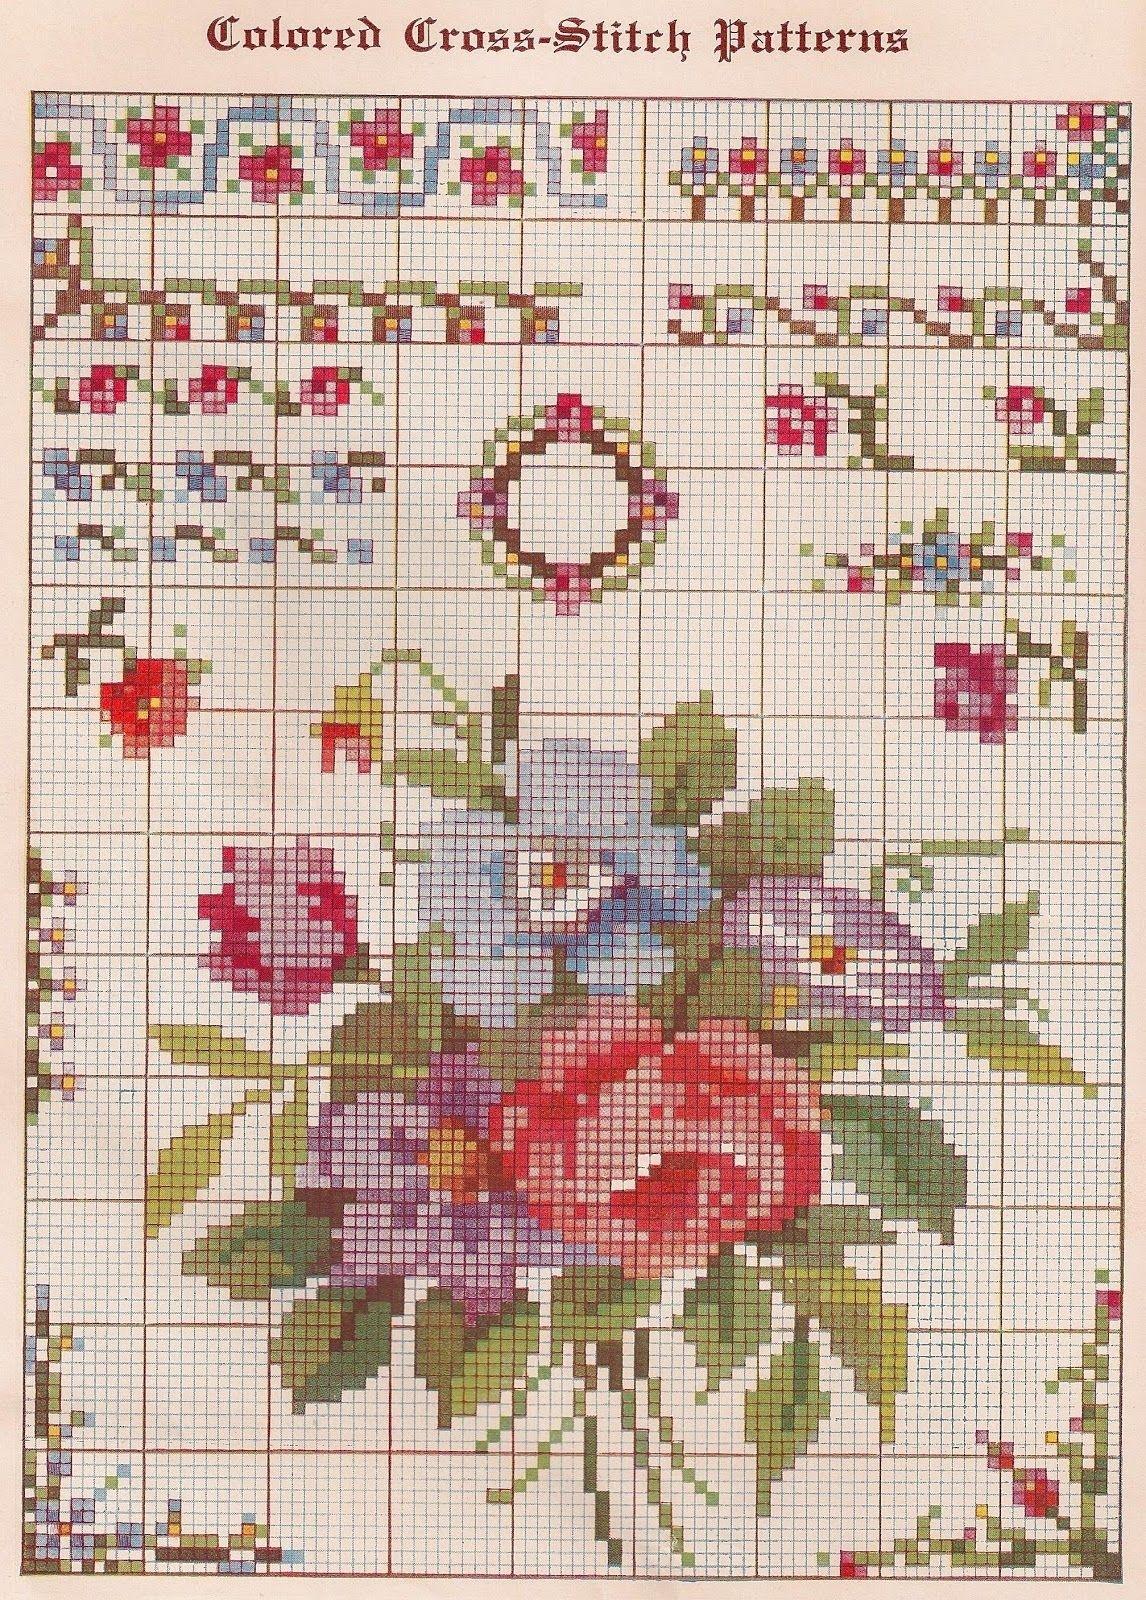 Cross Stitch Patterns Free Printable | Sentimental Baby: Free - Cross Stitch Patterns Free Printable